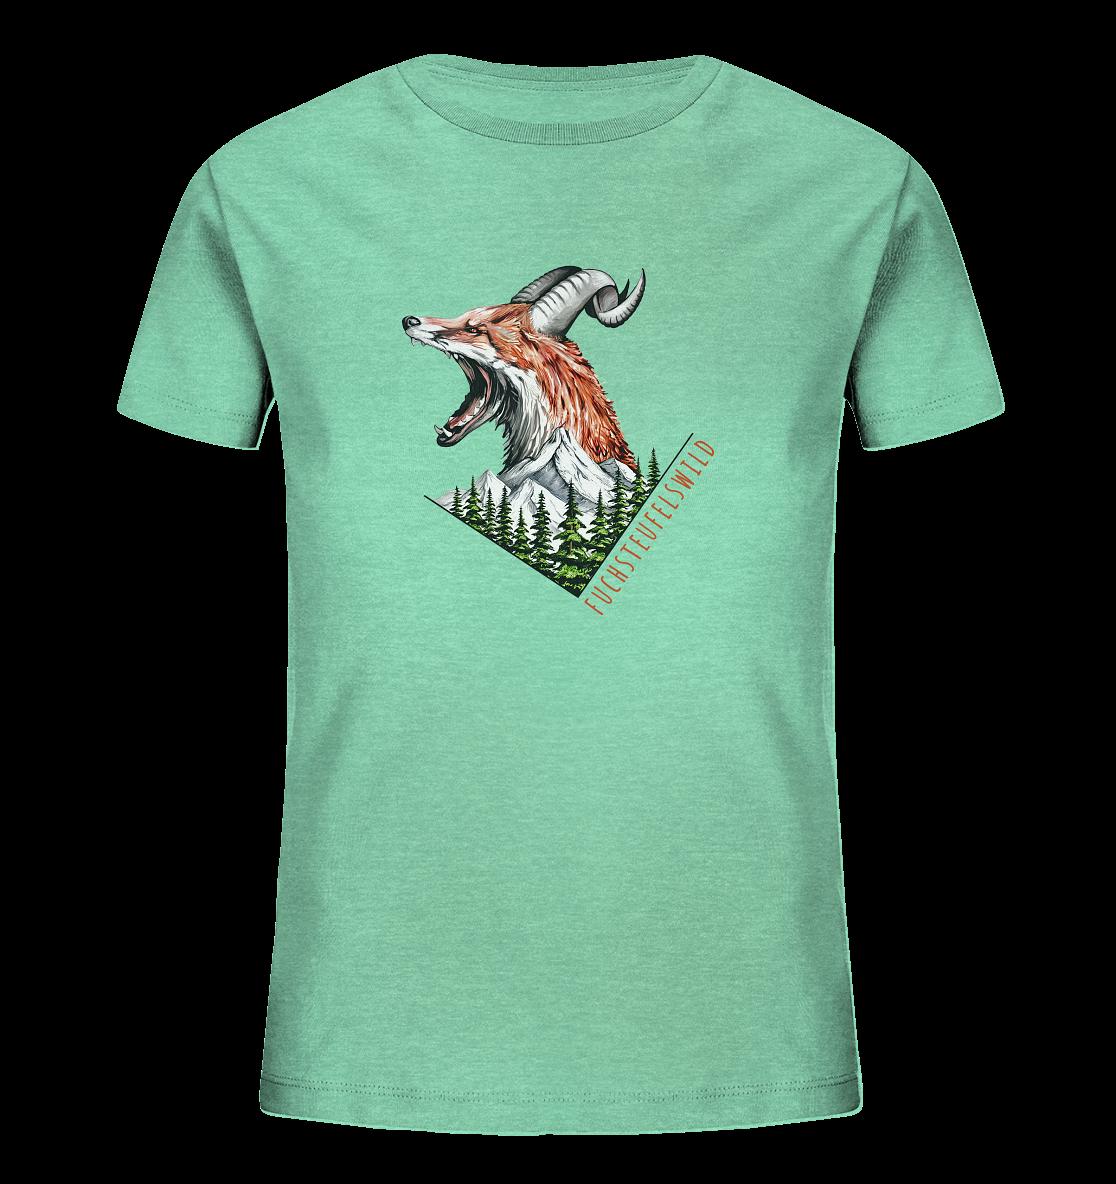 front-kids-organic-shirt-84e5bd-1116x-2.png